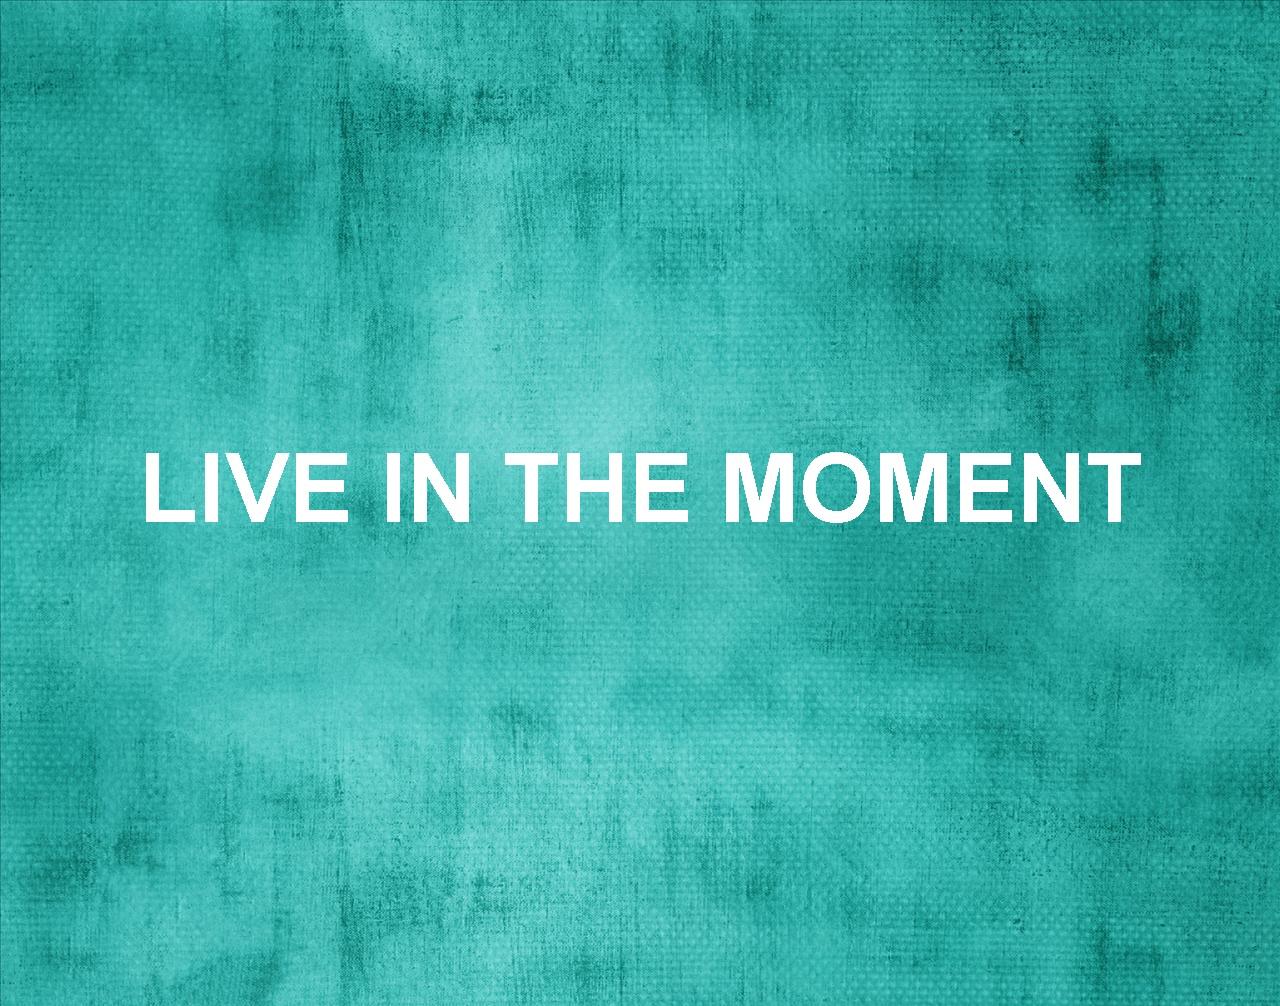 Teal Motivational Quotes Quotesgram